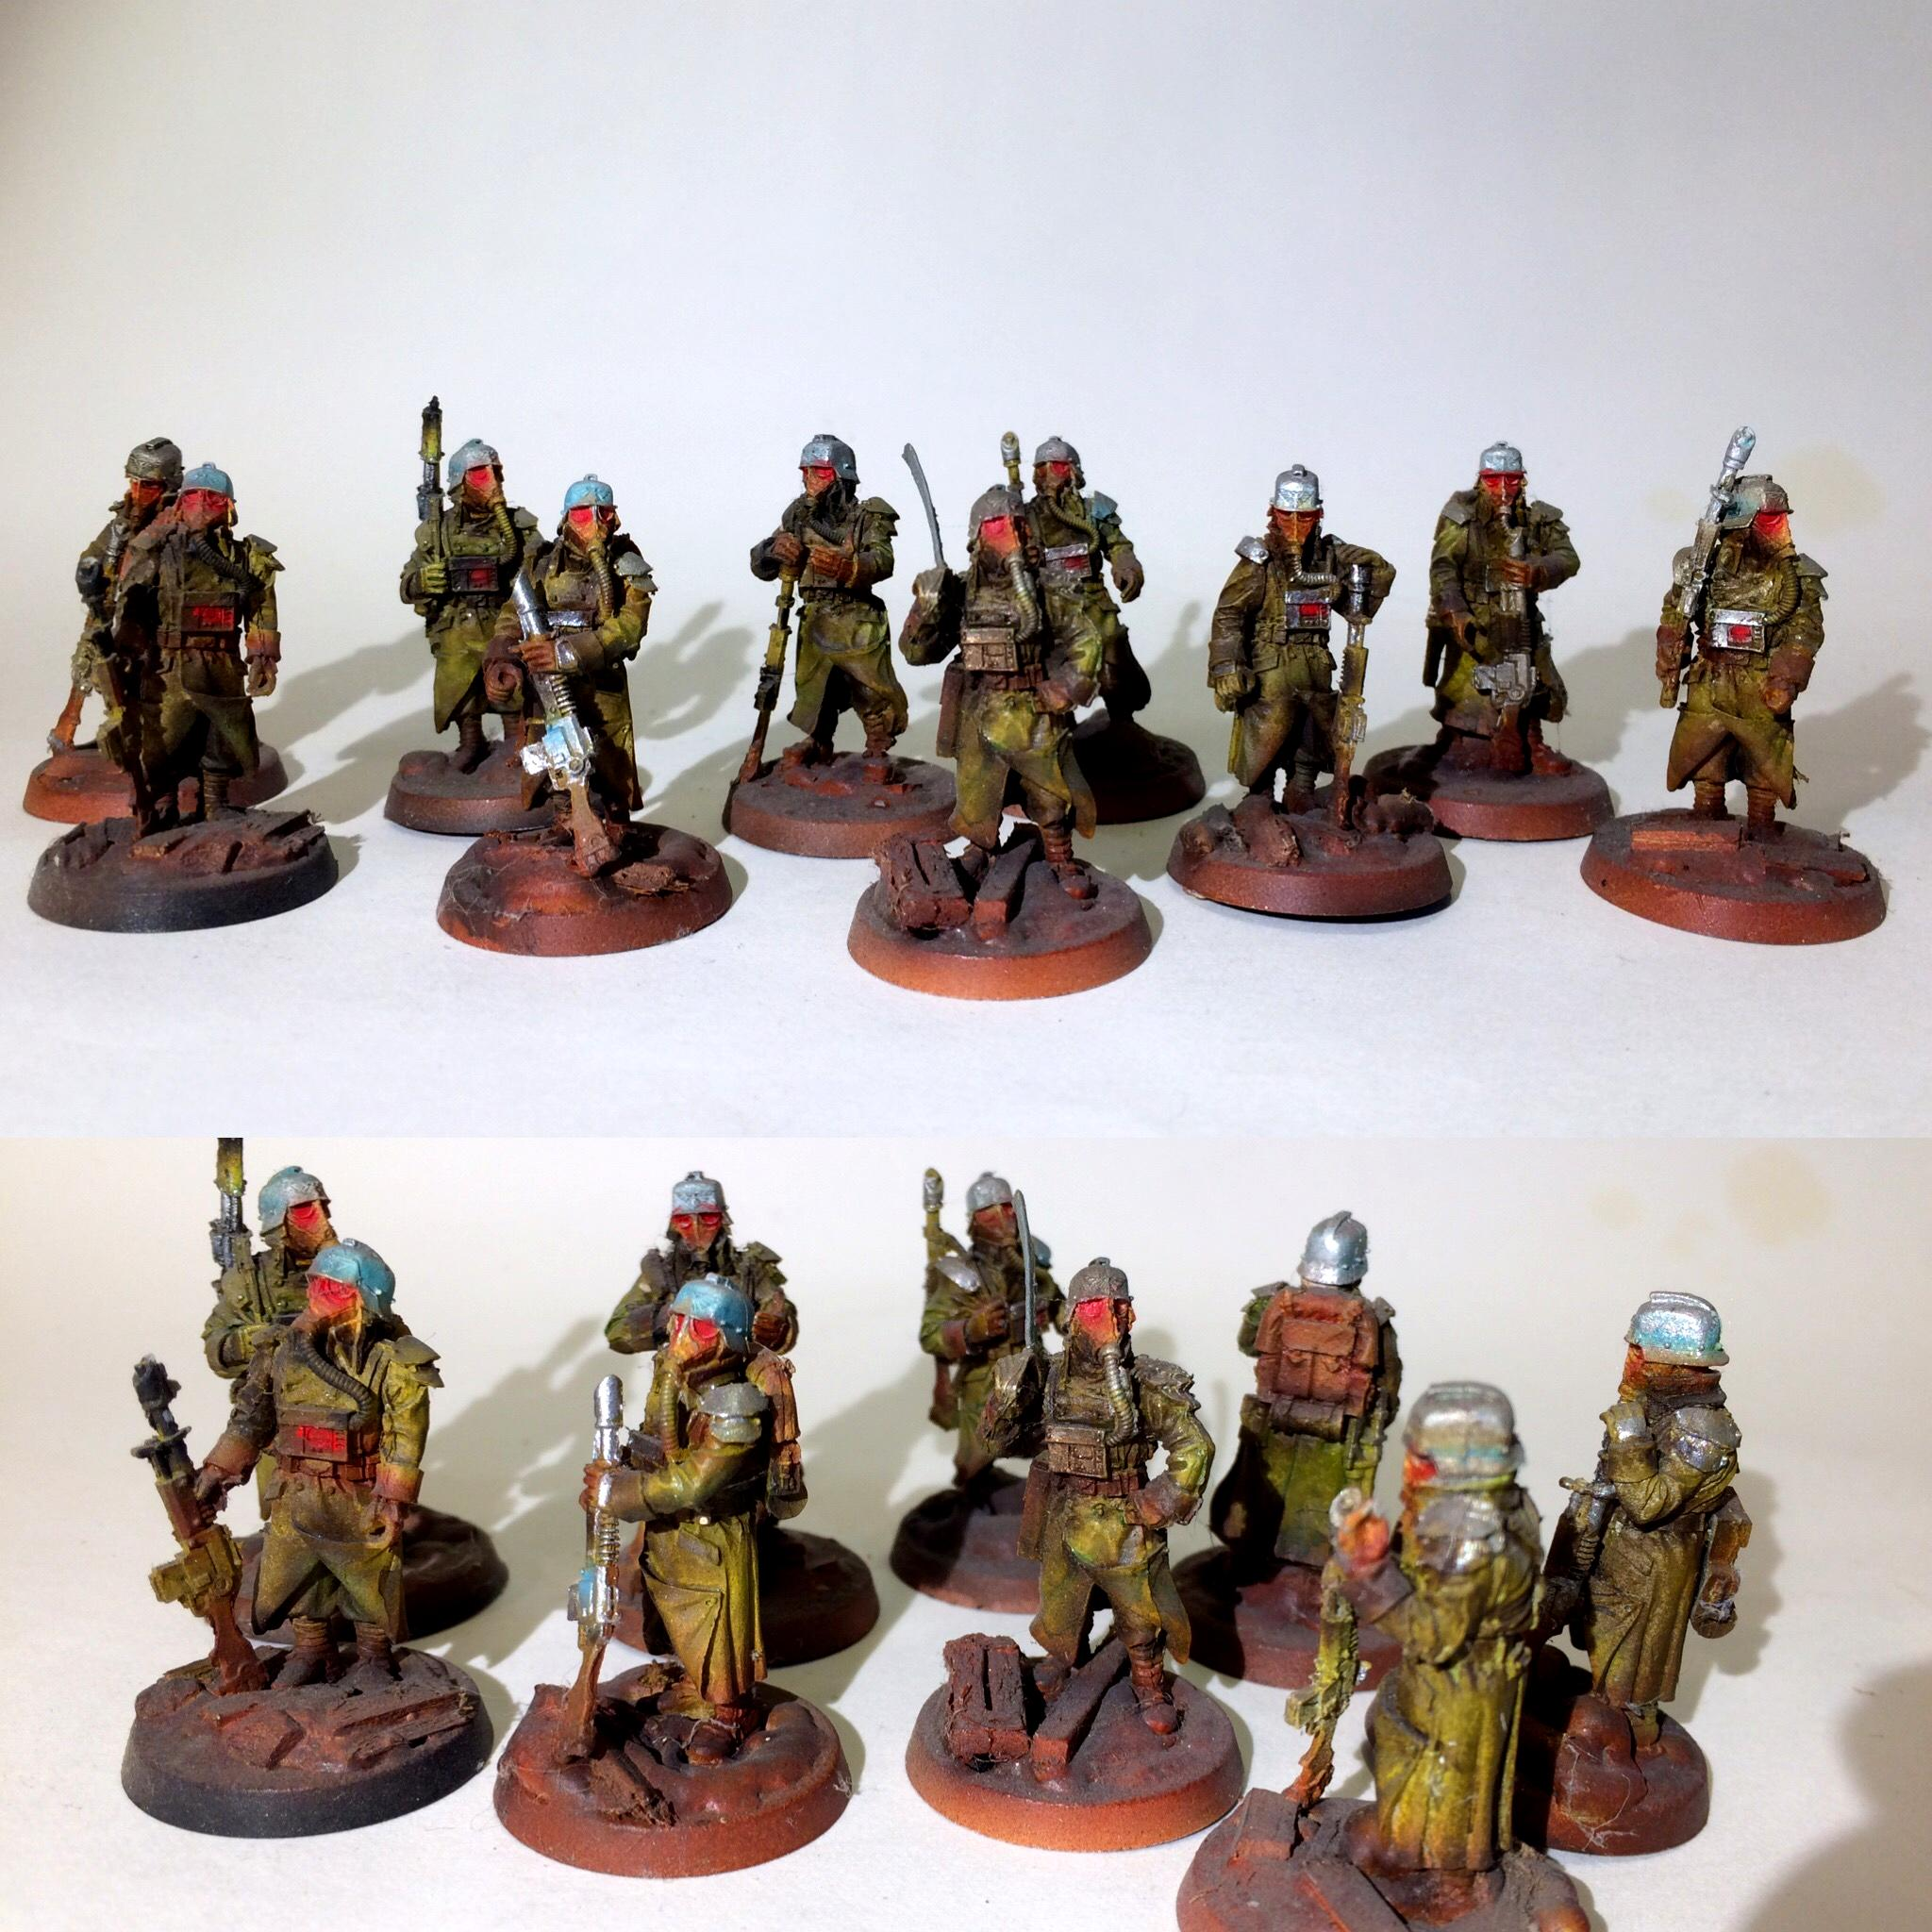 Airbrushed, Astra Militarum, Custom, Death Korps of Krieg, Flocked, Forge World, Infantry, Warhammer 40,000